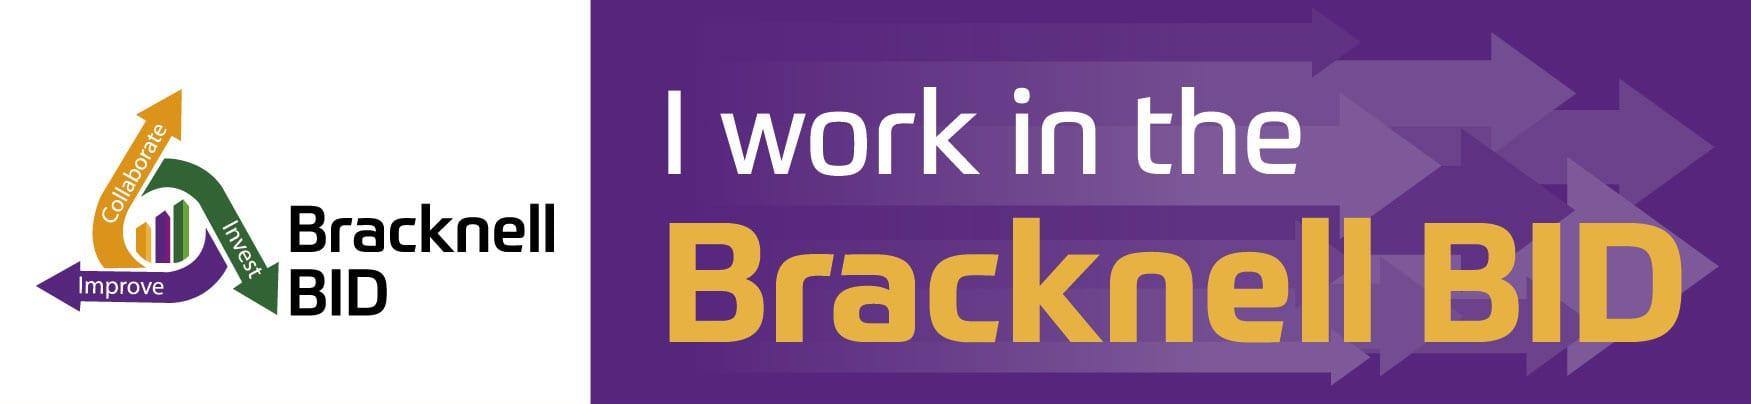 I-work-in-the-Bracknell-BID-eHeader-v2 copy